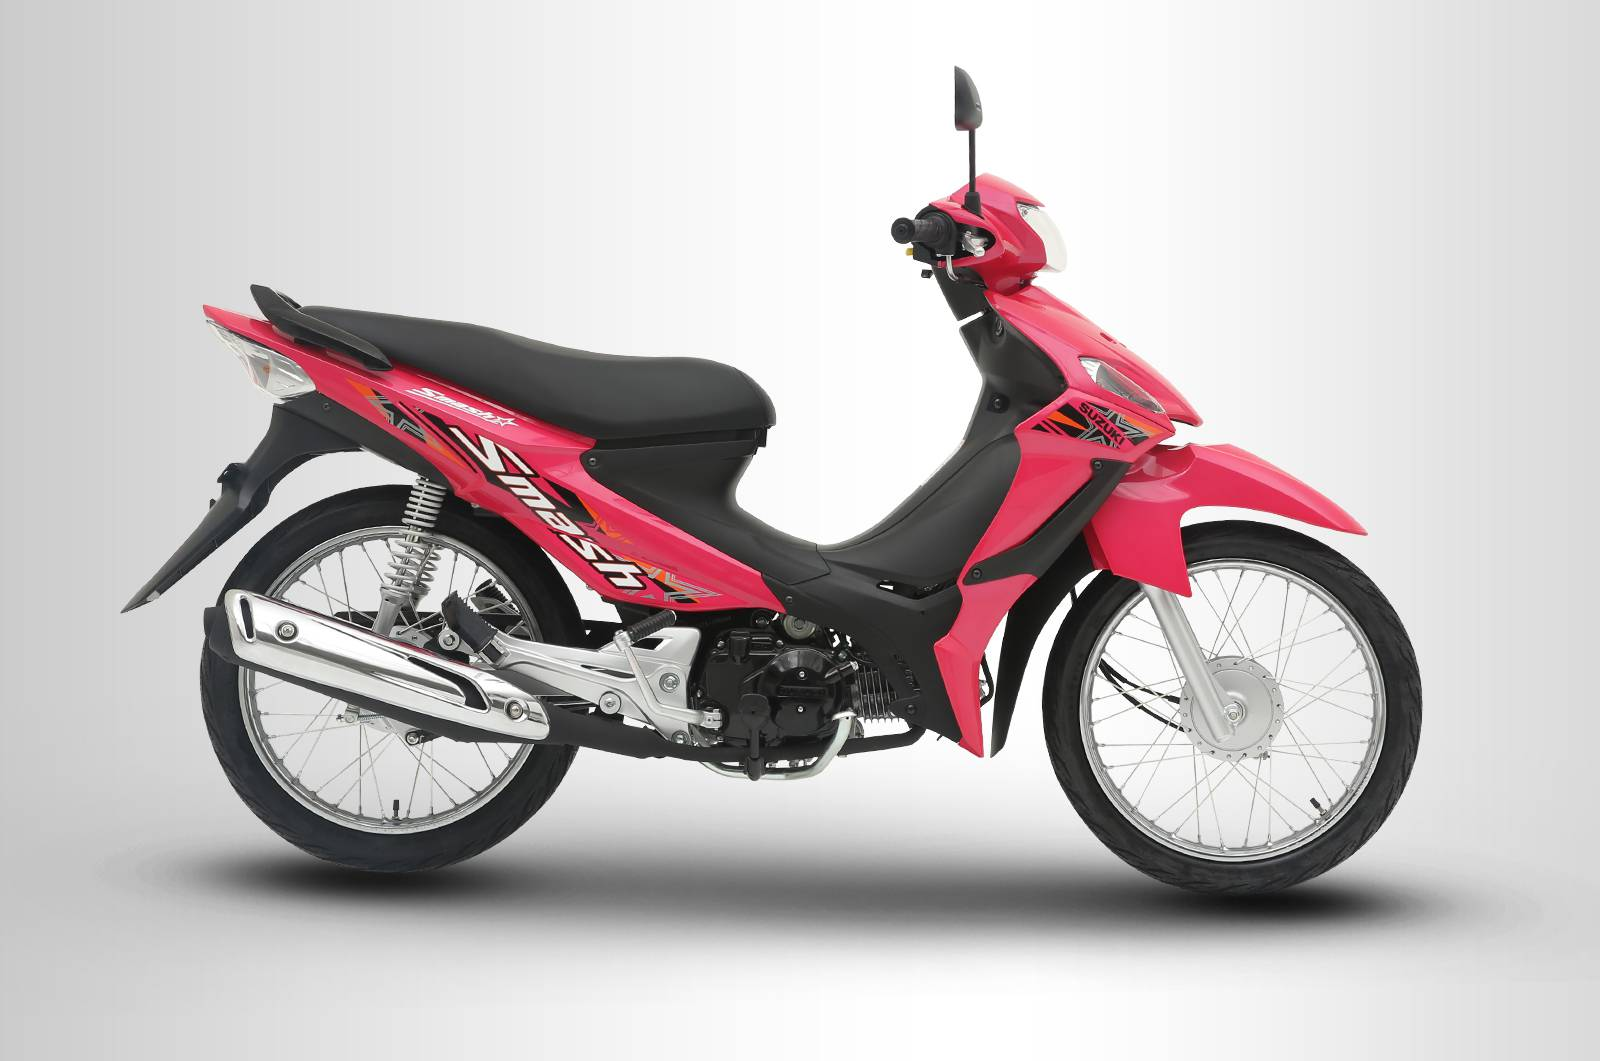 Motortrade | Philippine's Best Motorcycle Dealer | SUZUKI